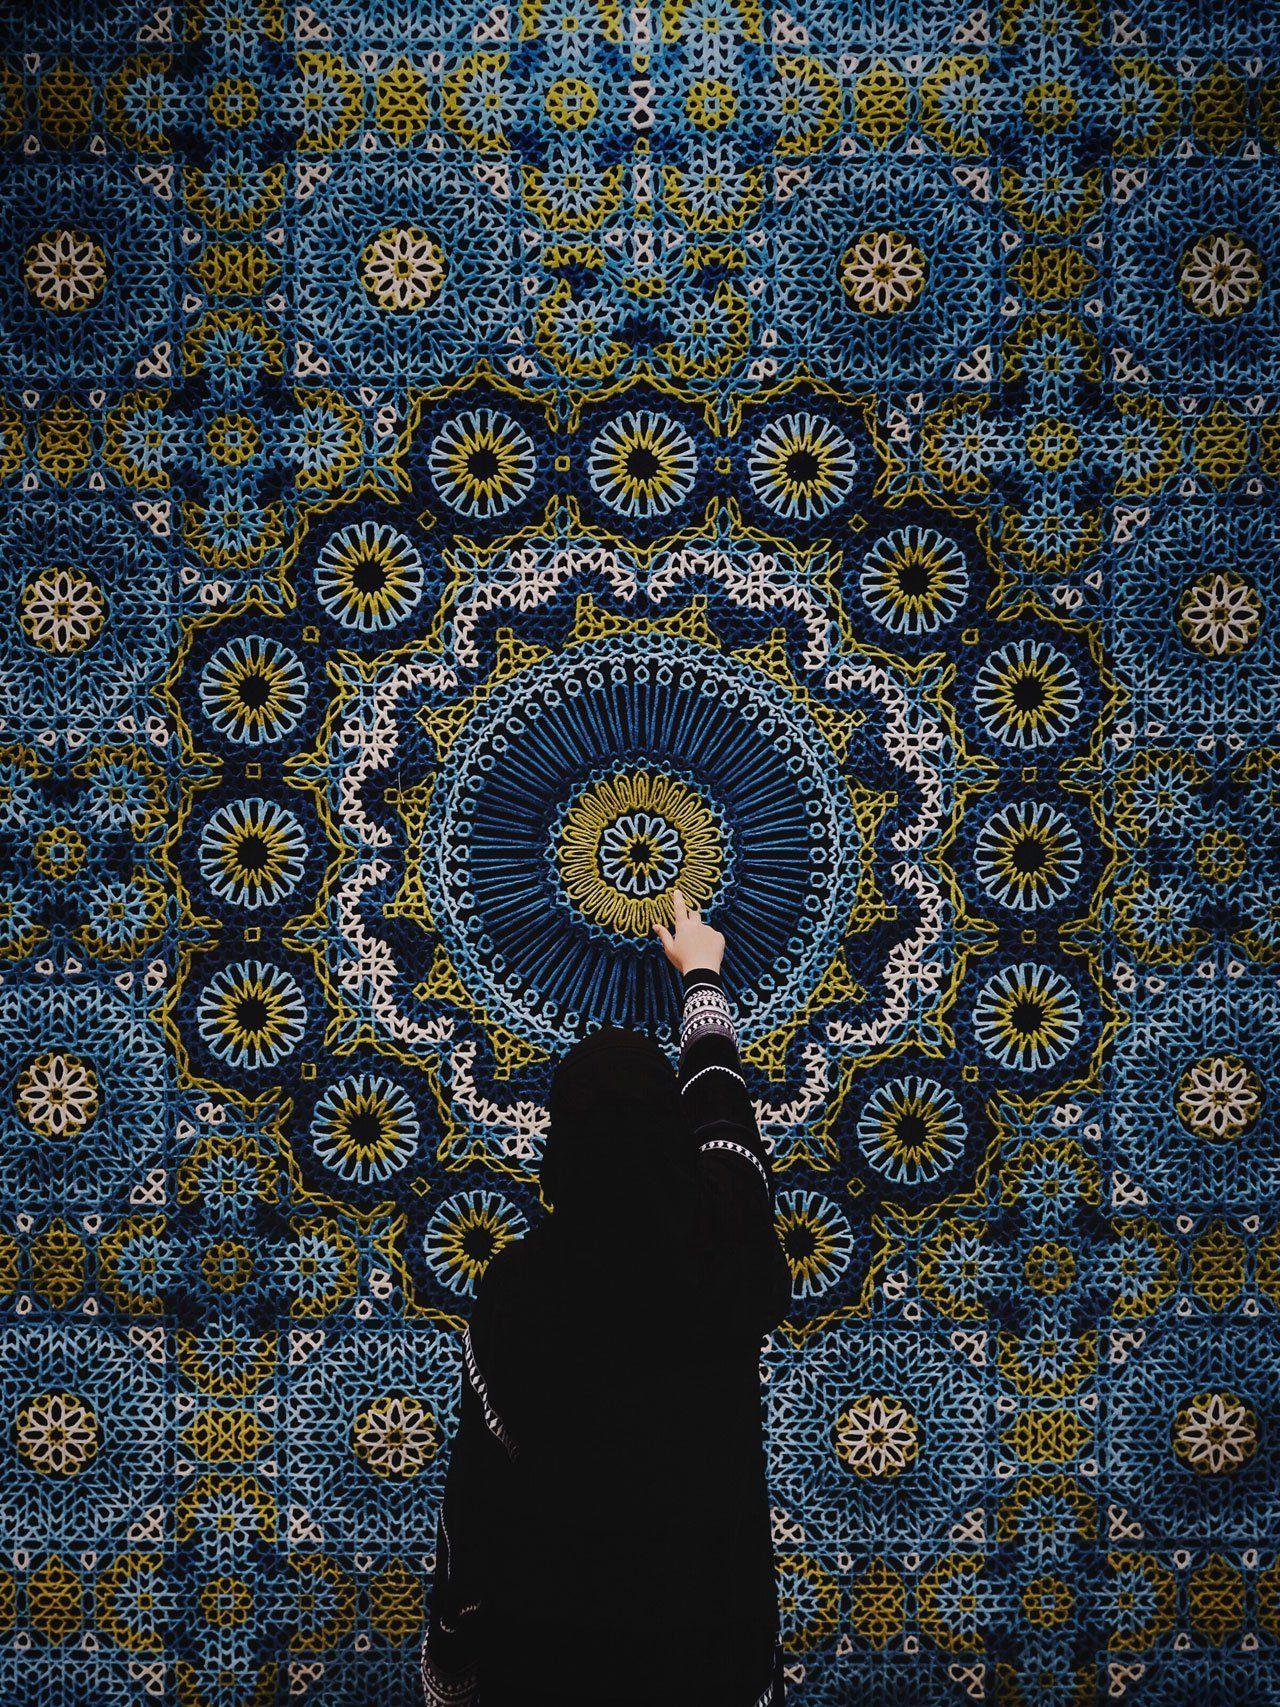 The Hammam Deluxe carpet by Samovar Carpets. Photo byHerald Herrera at Downtown Design Dubai 2015.